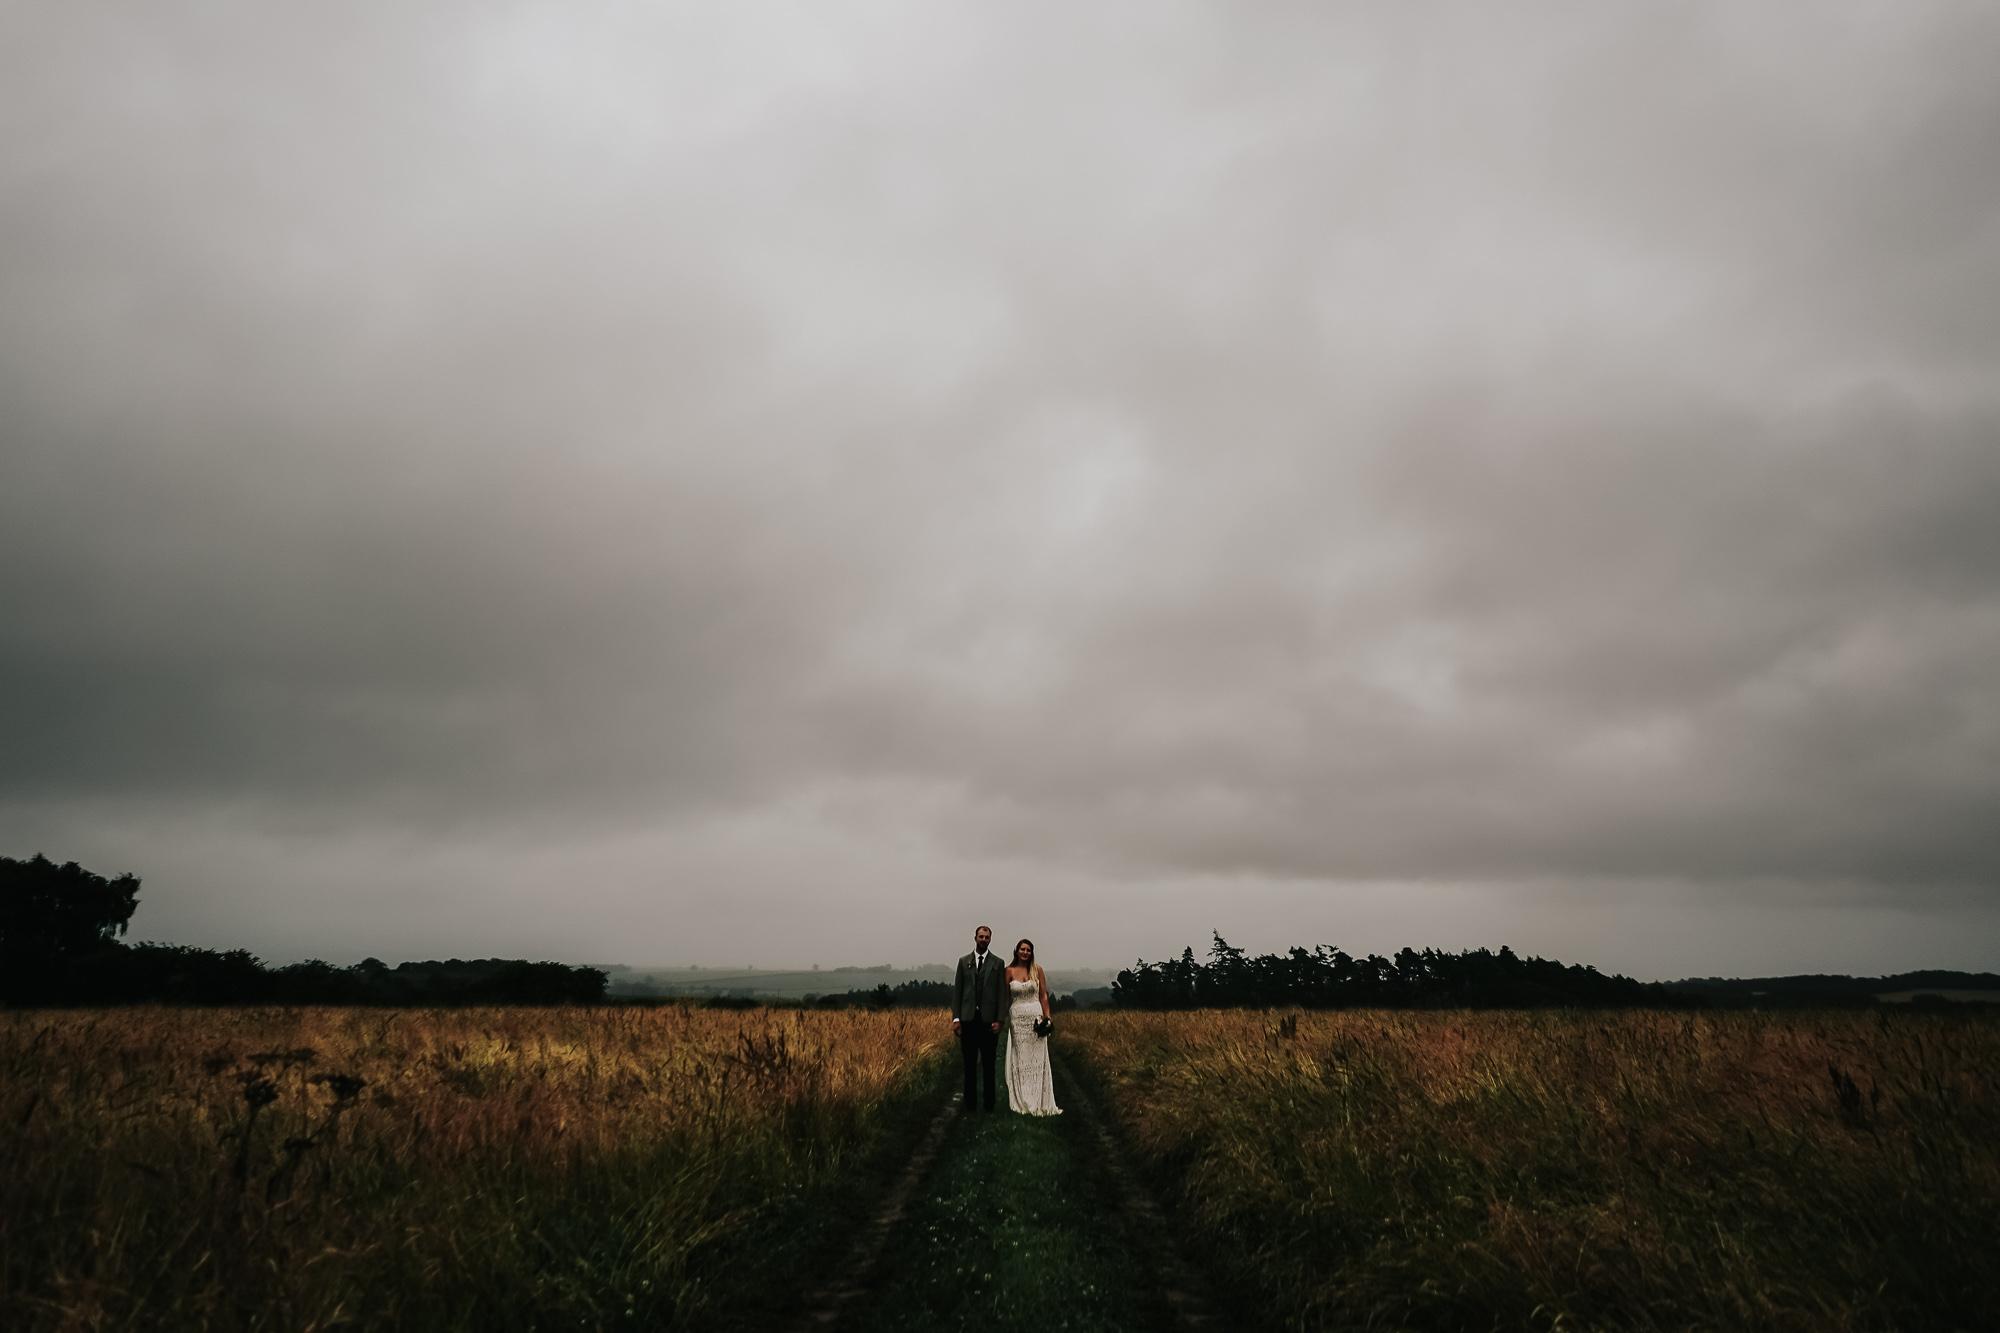 High Barn Wedding photographer lake distect penrith documentry wedding photography (52 of 57).jpg